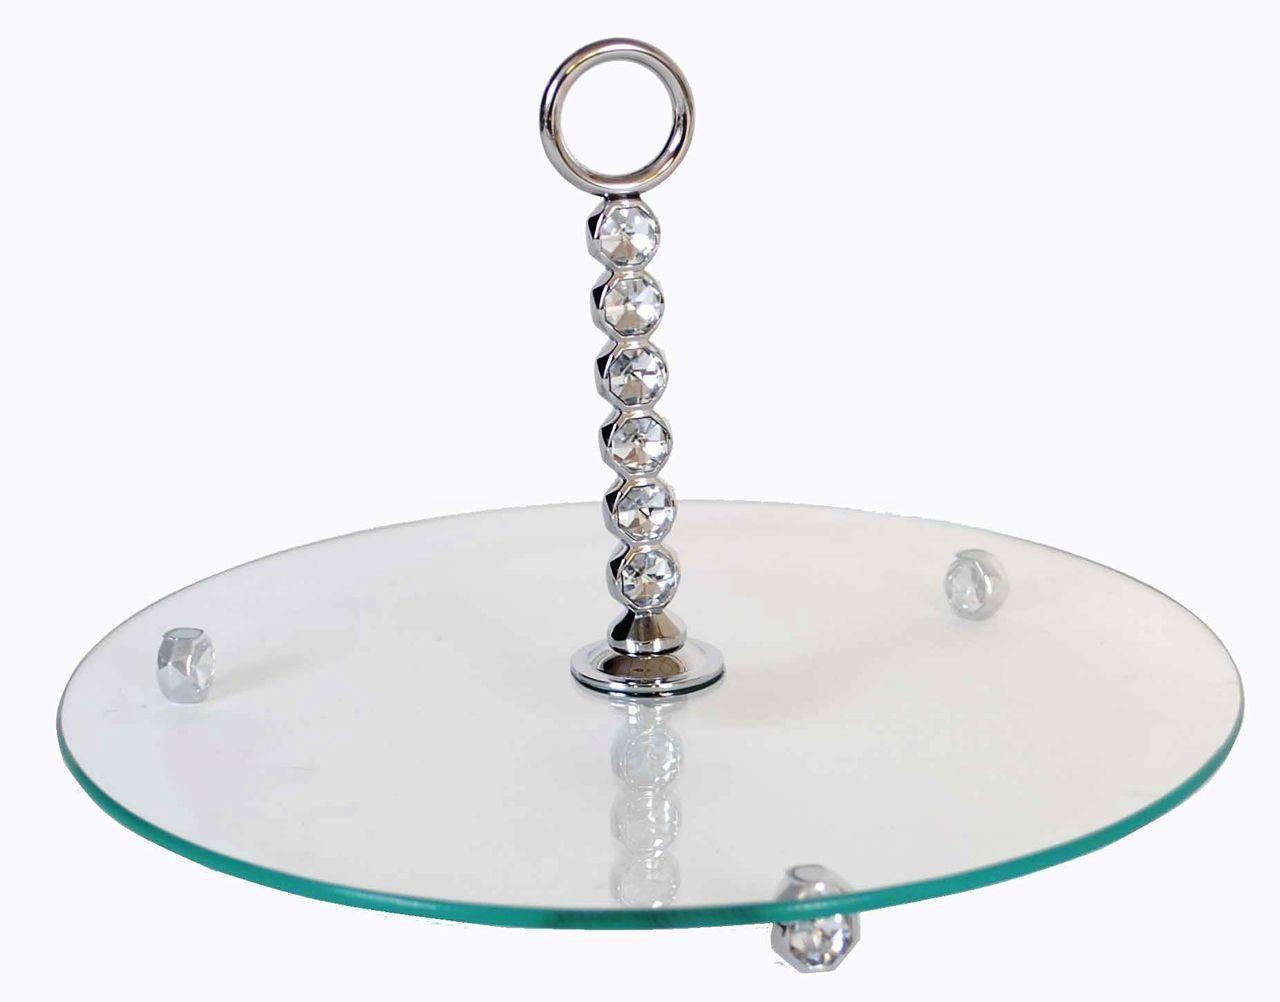 plateau en verre rond thire en verre ronde with plateau. Black Bedroom Furniture Sets. Home Design Ideas